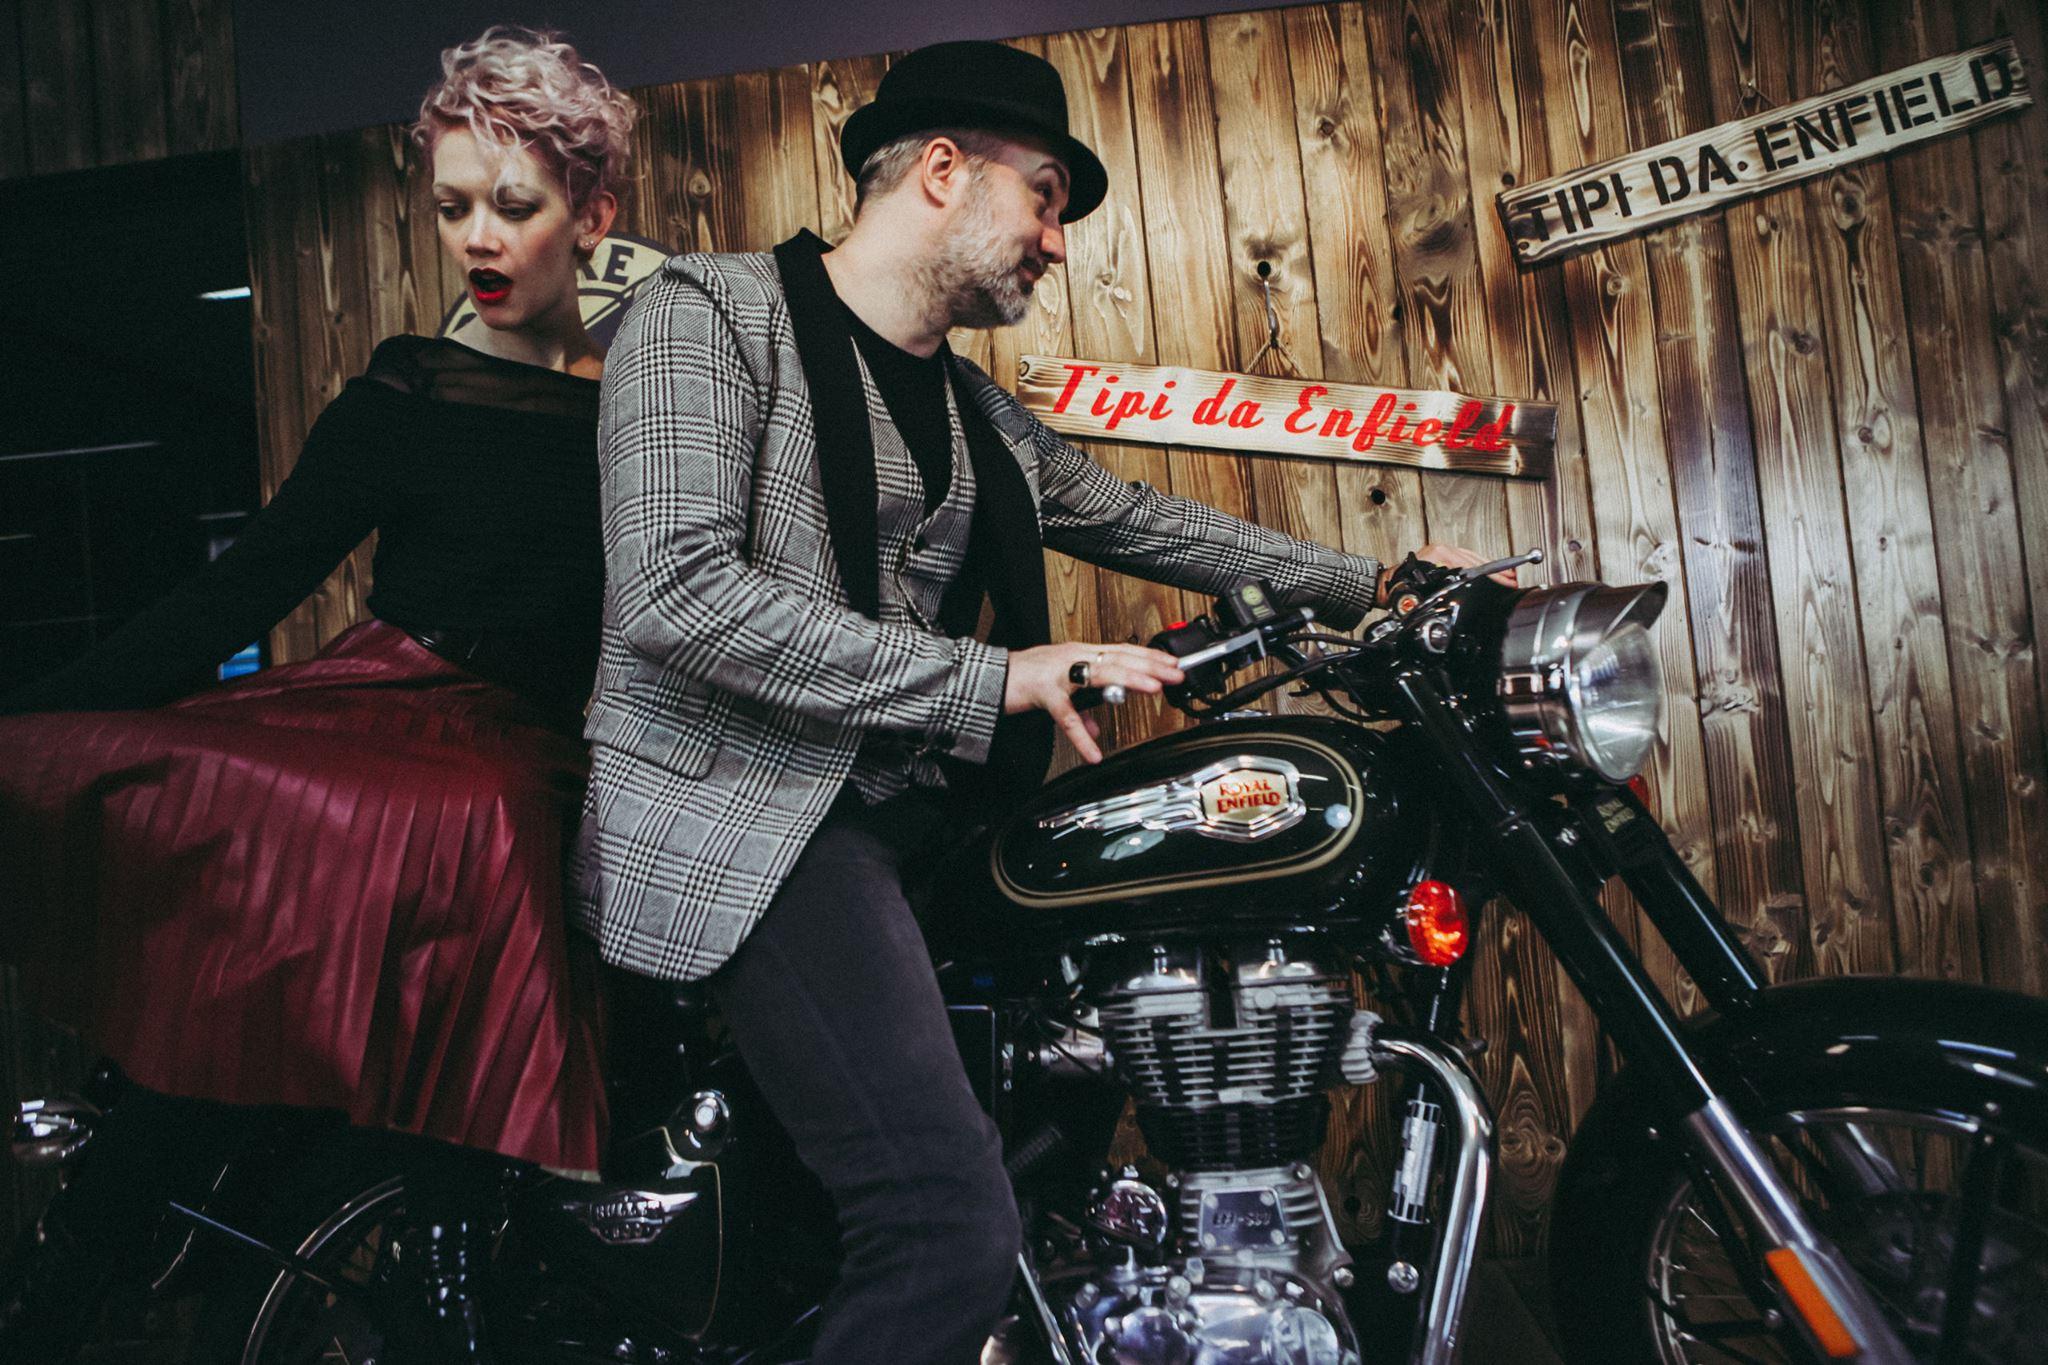 royal-enfield-piacenza-moruzzi-moto-wonderland-campagna-promo-15